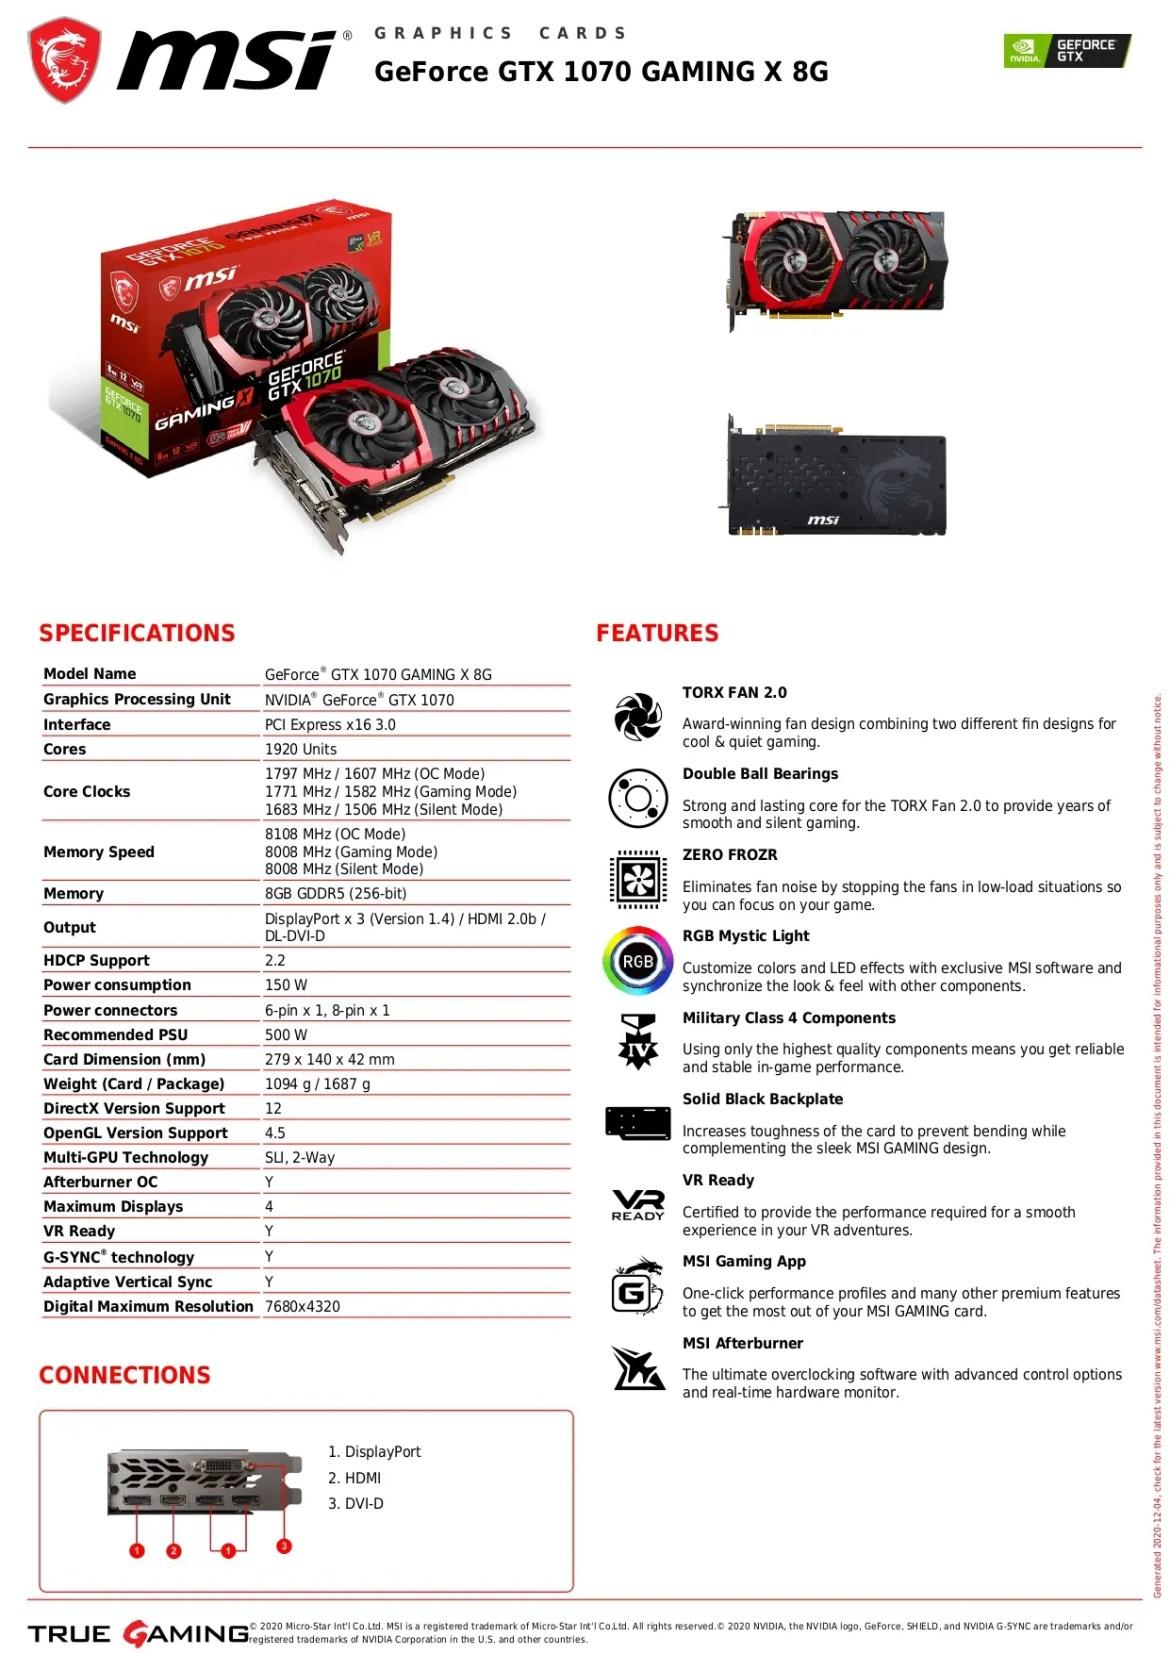 MSI GeForce GTX 1070 GAMING X 8G Graphics Card